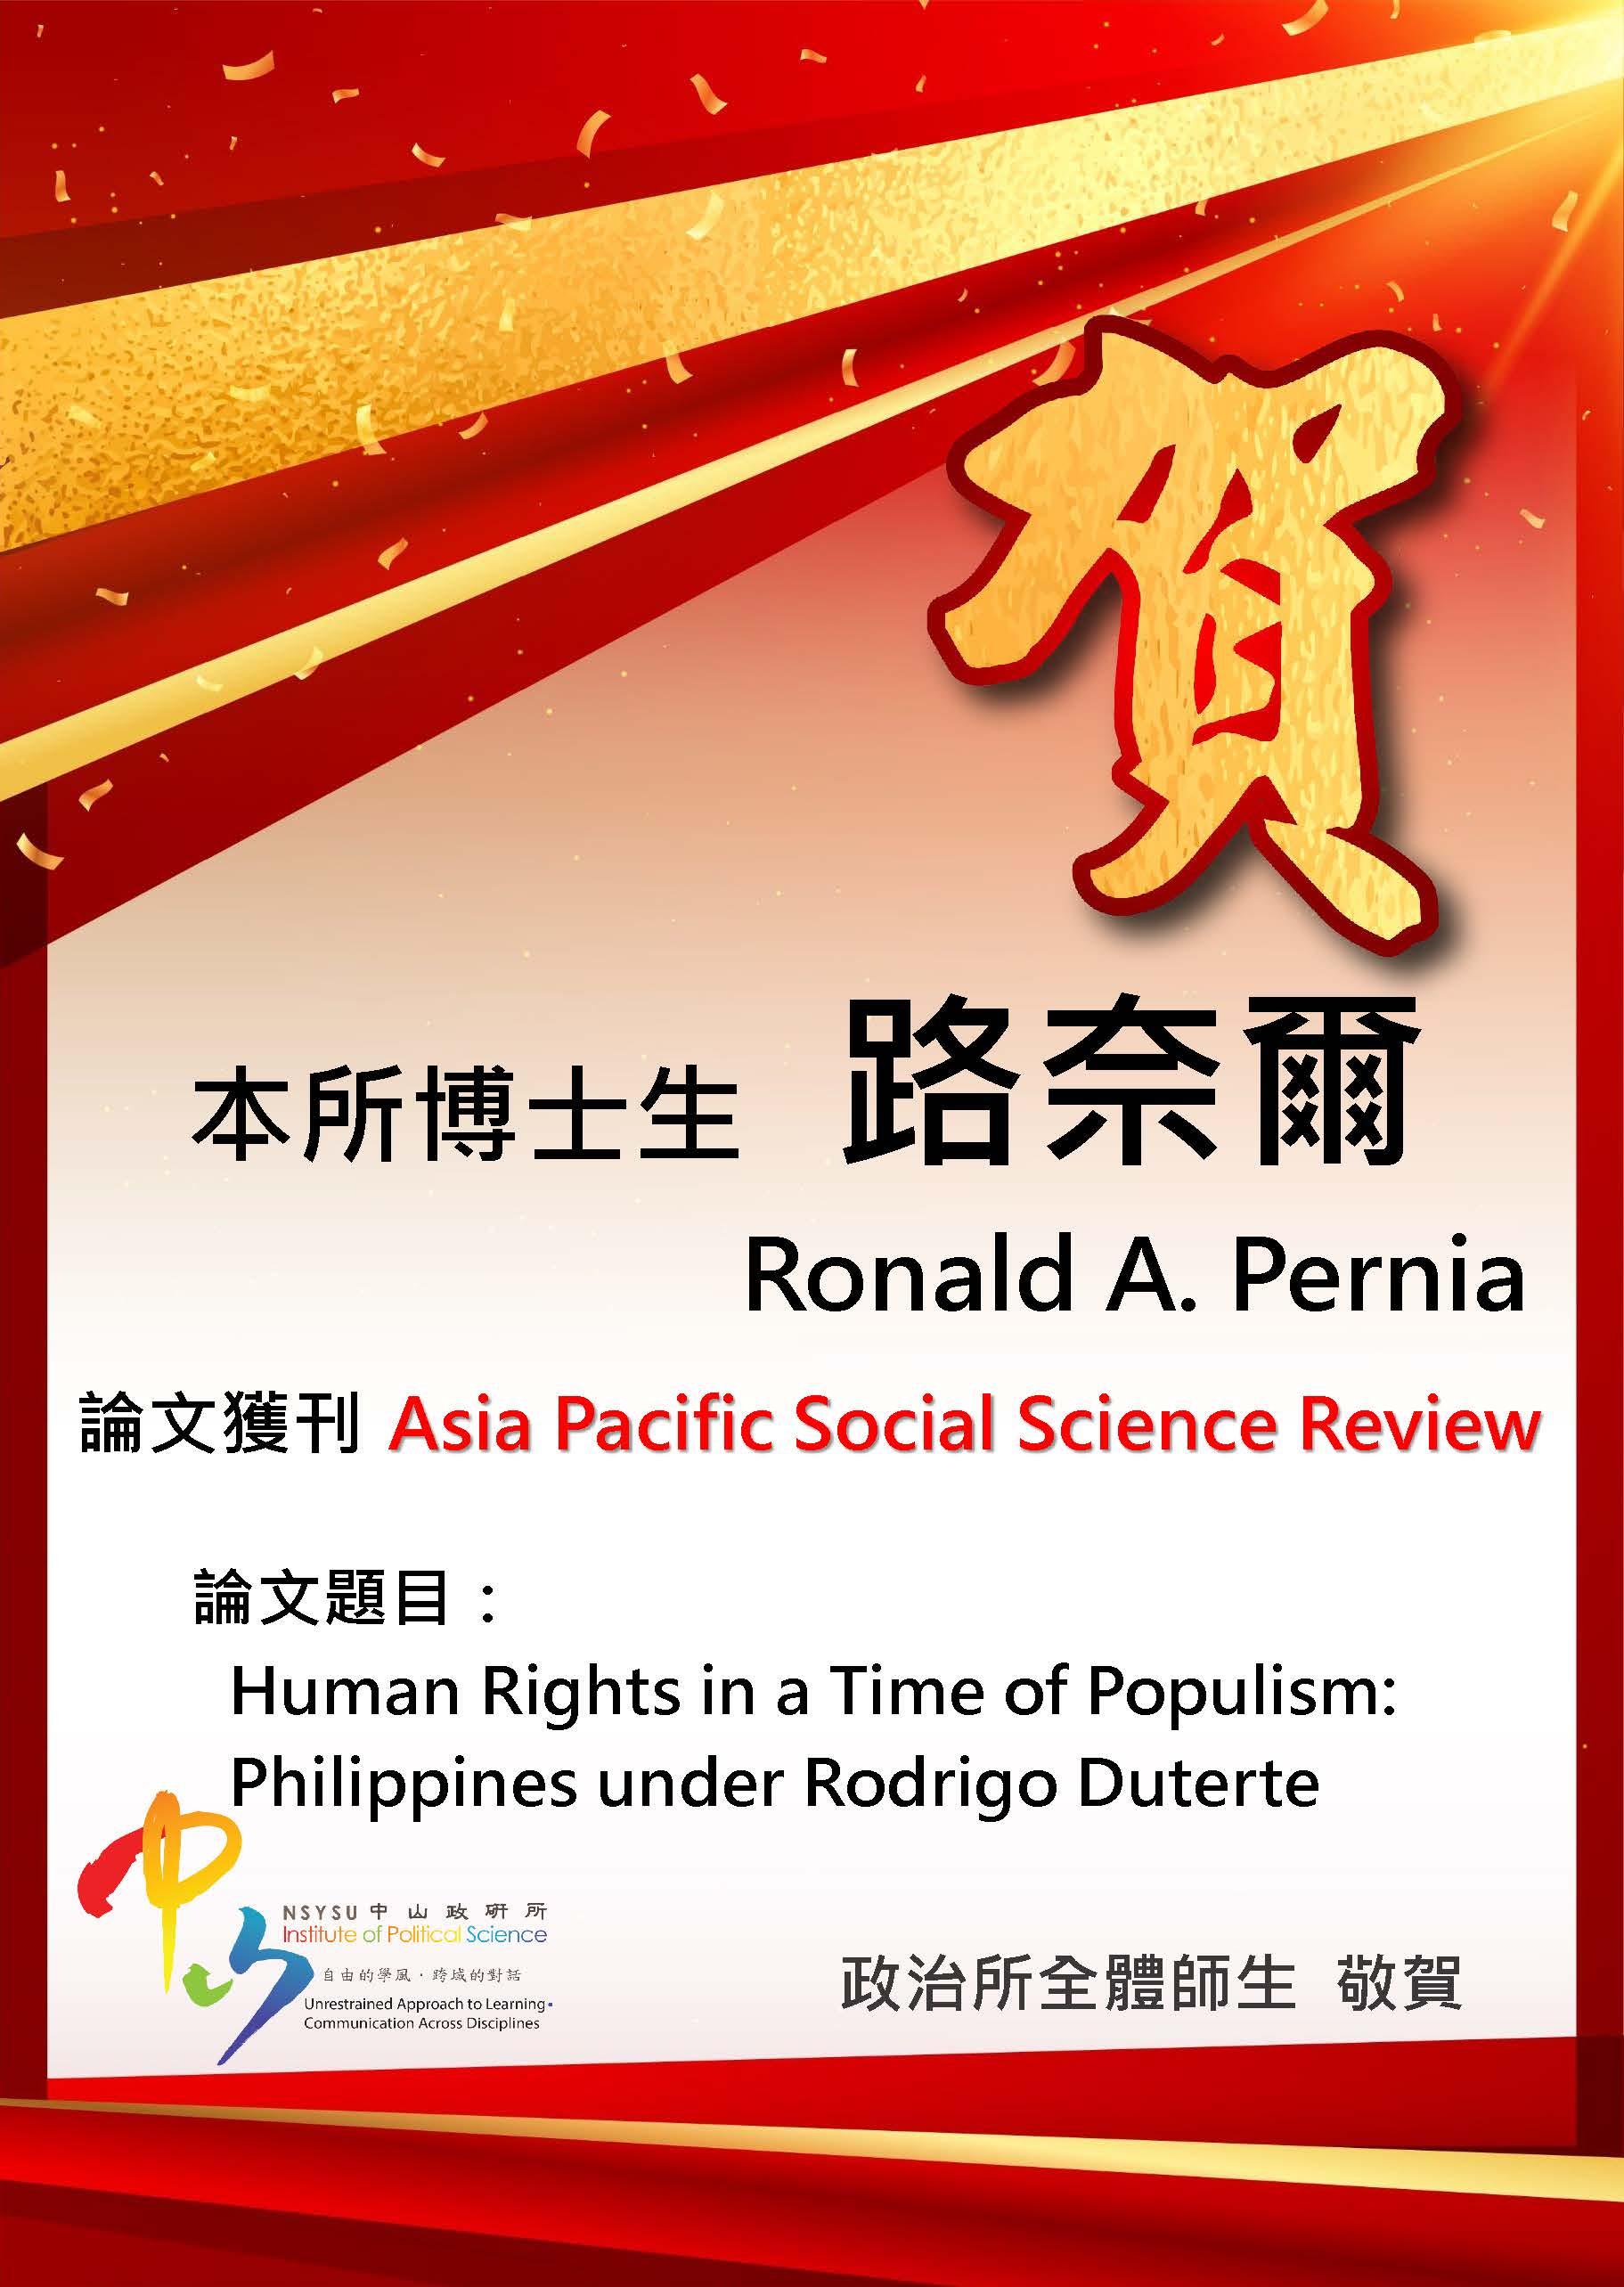 Human Rights in a Time of Populism: Philippines under Rodrigo Duterte